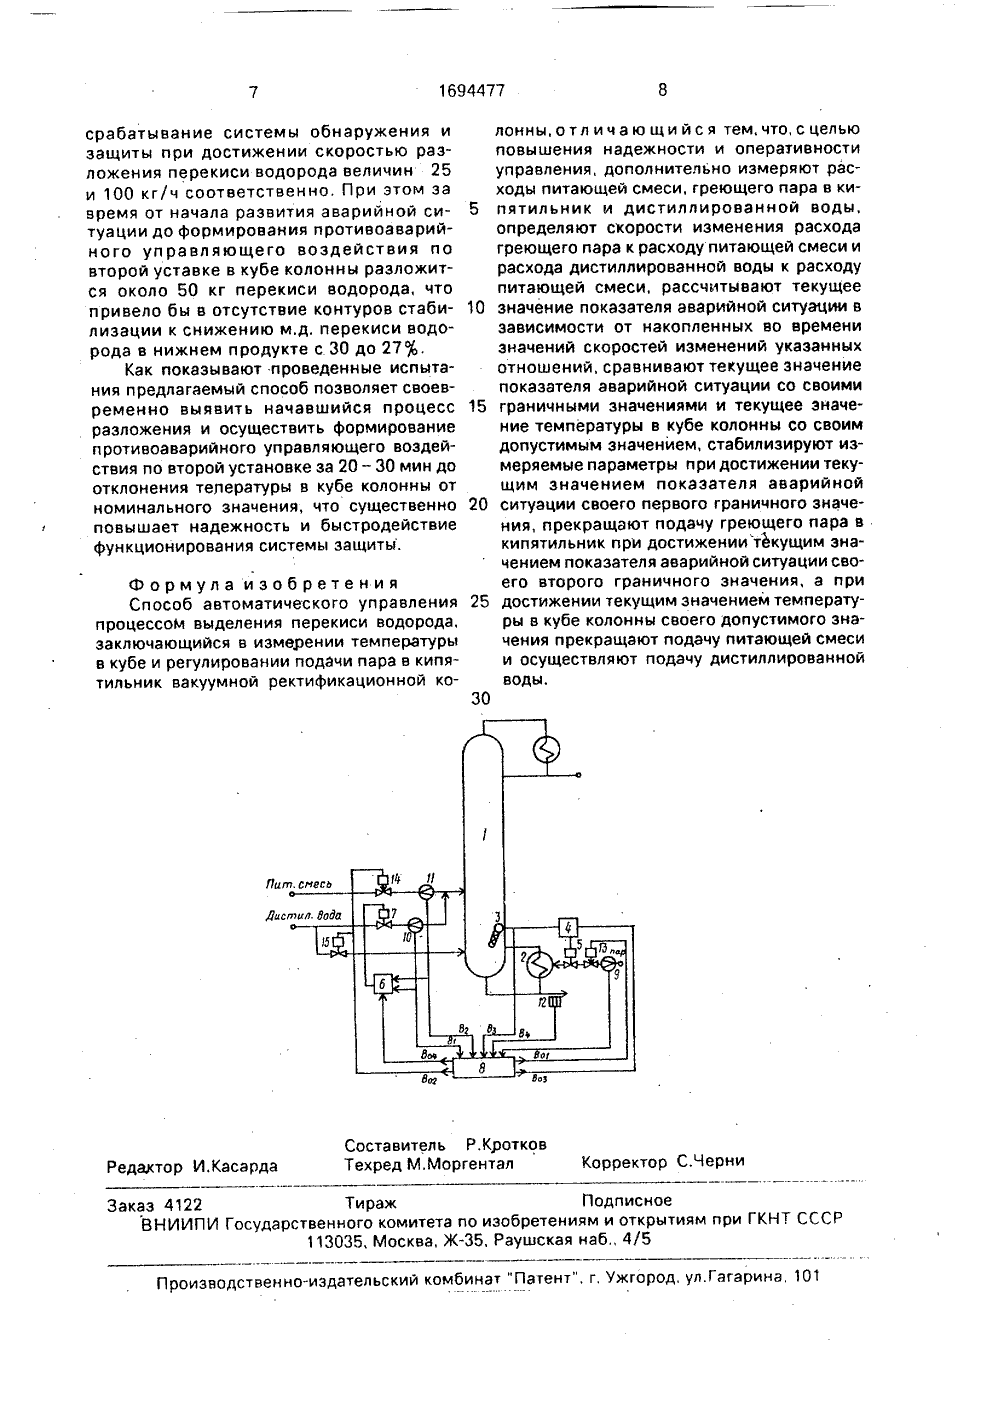 Формула перекиси водорода 13 фотография